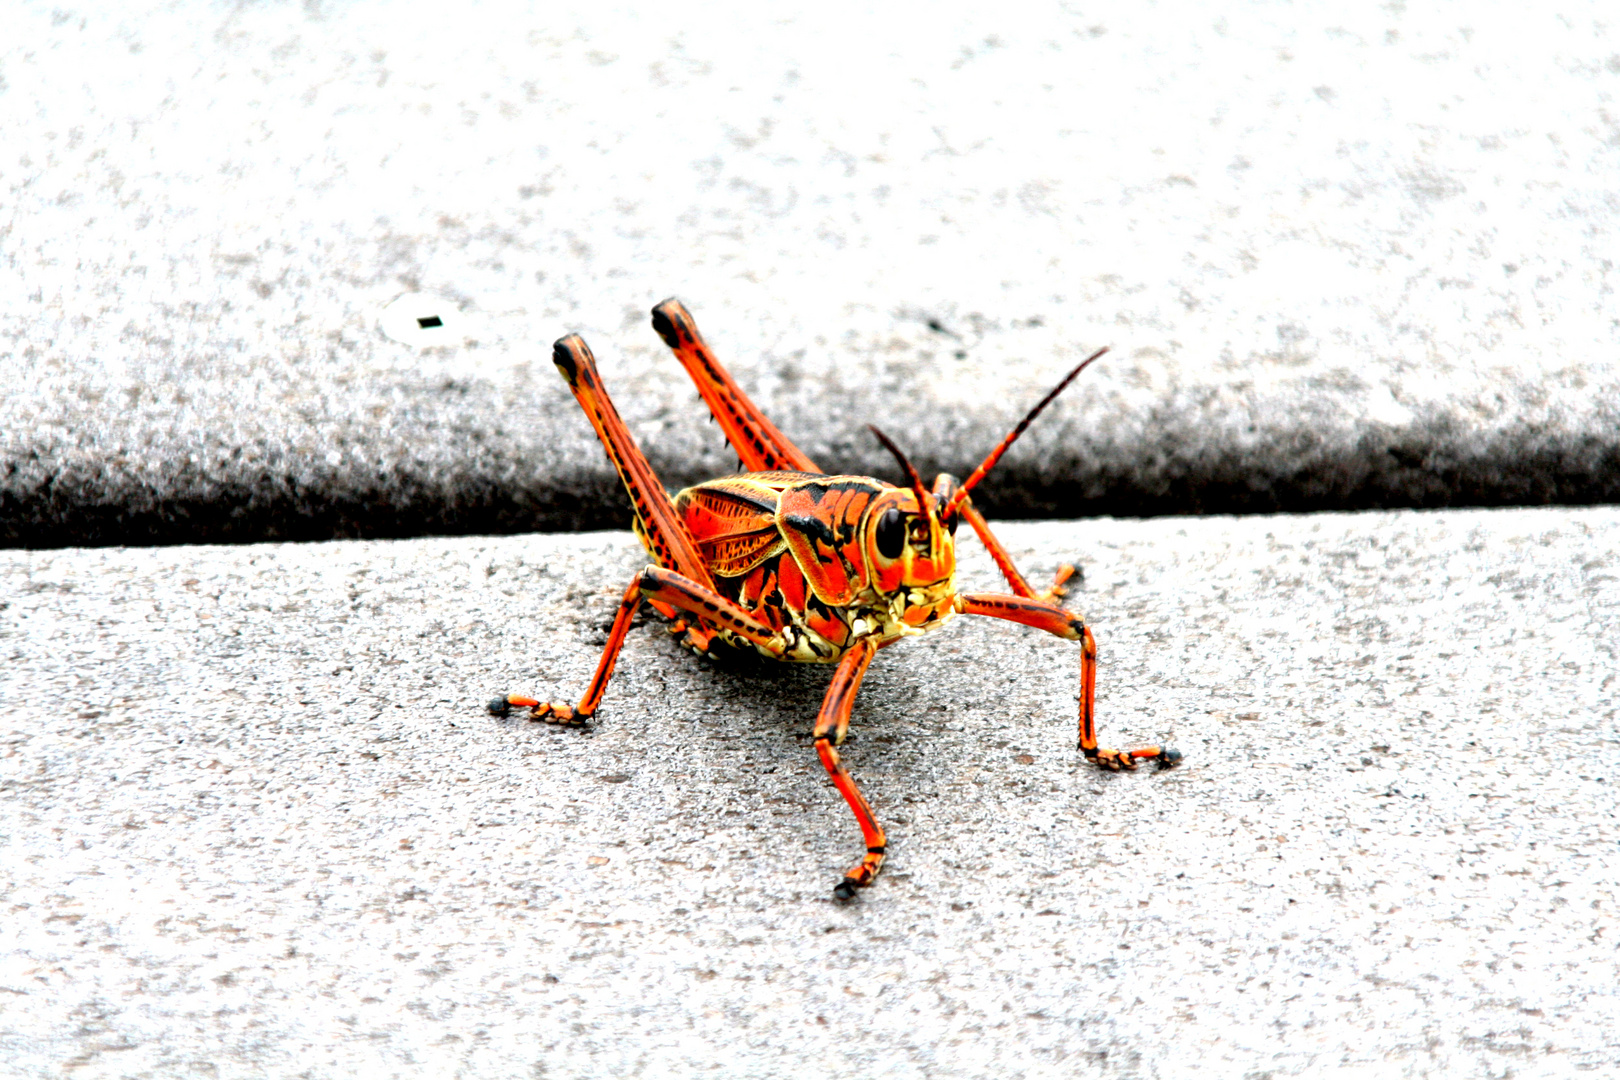 Florida grasshopper